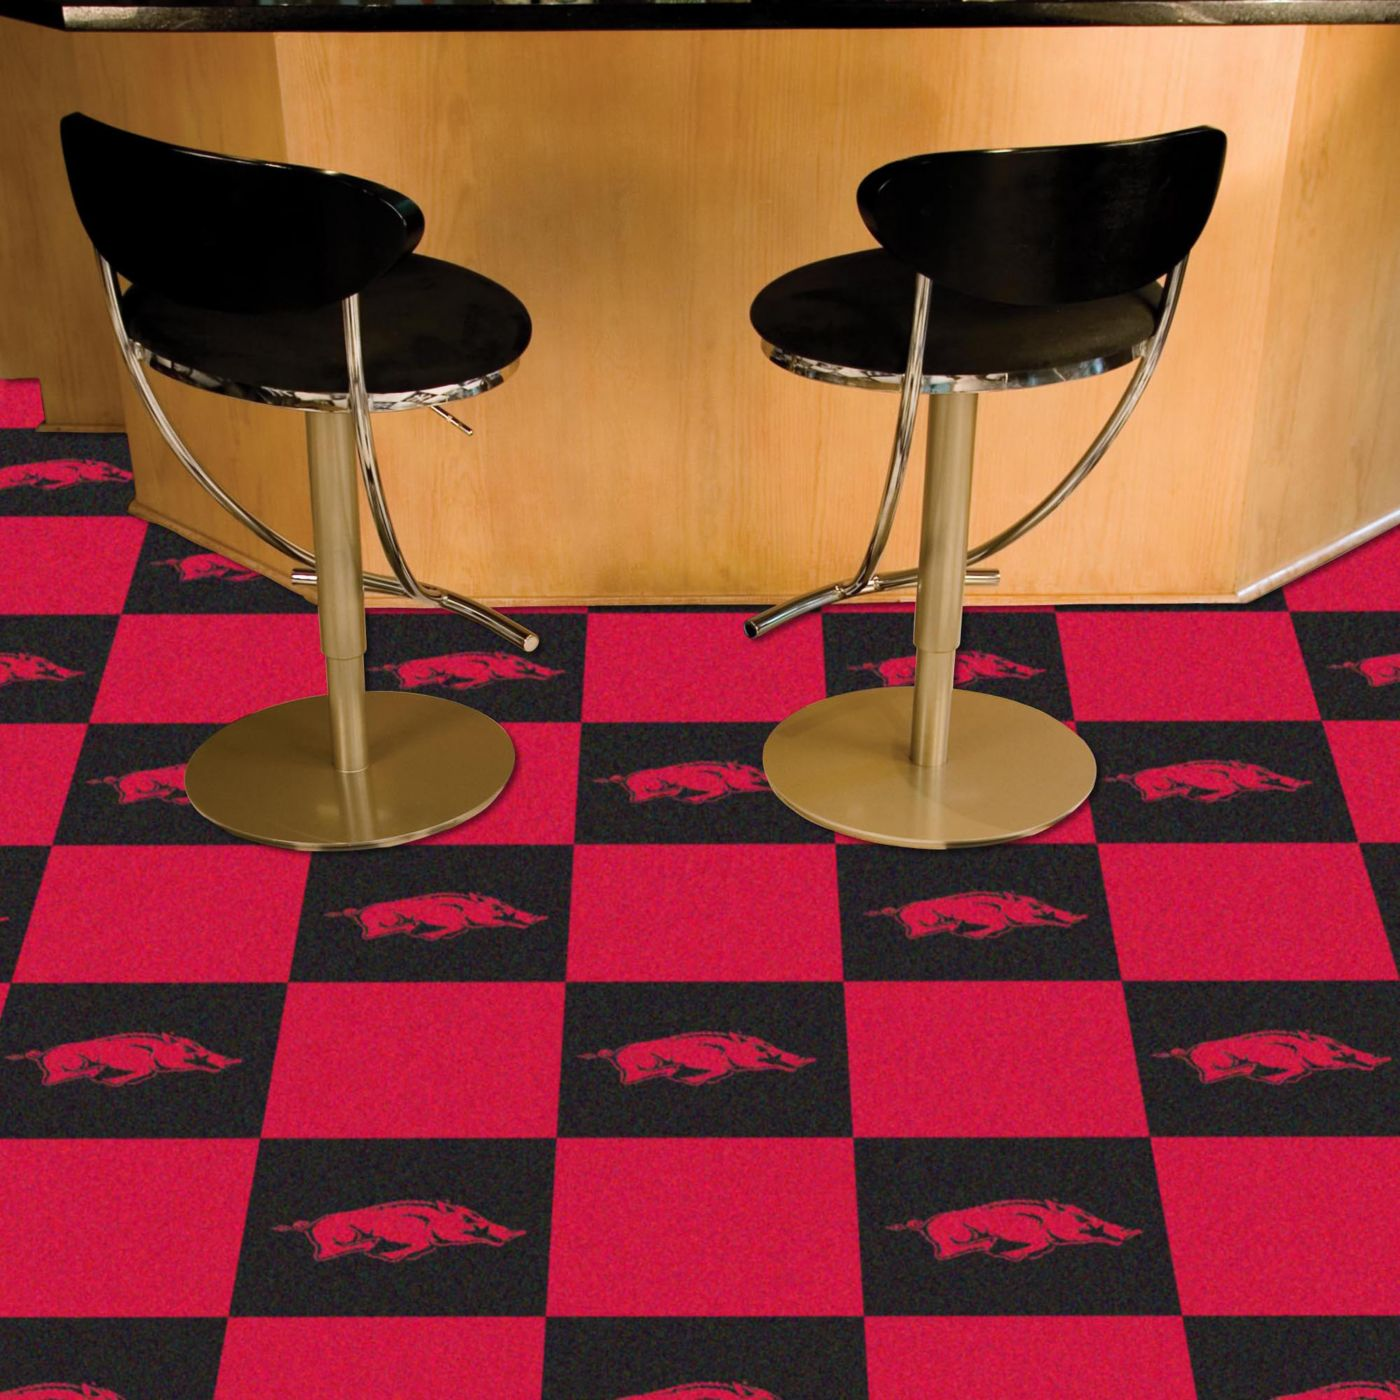 FANMATS Arkansas Razorbacks Team Carpet Tiles